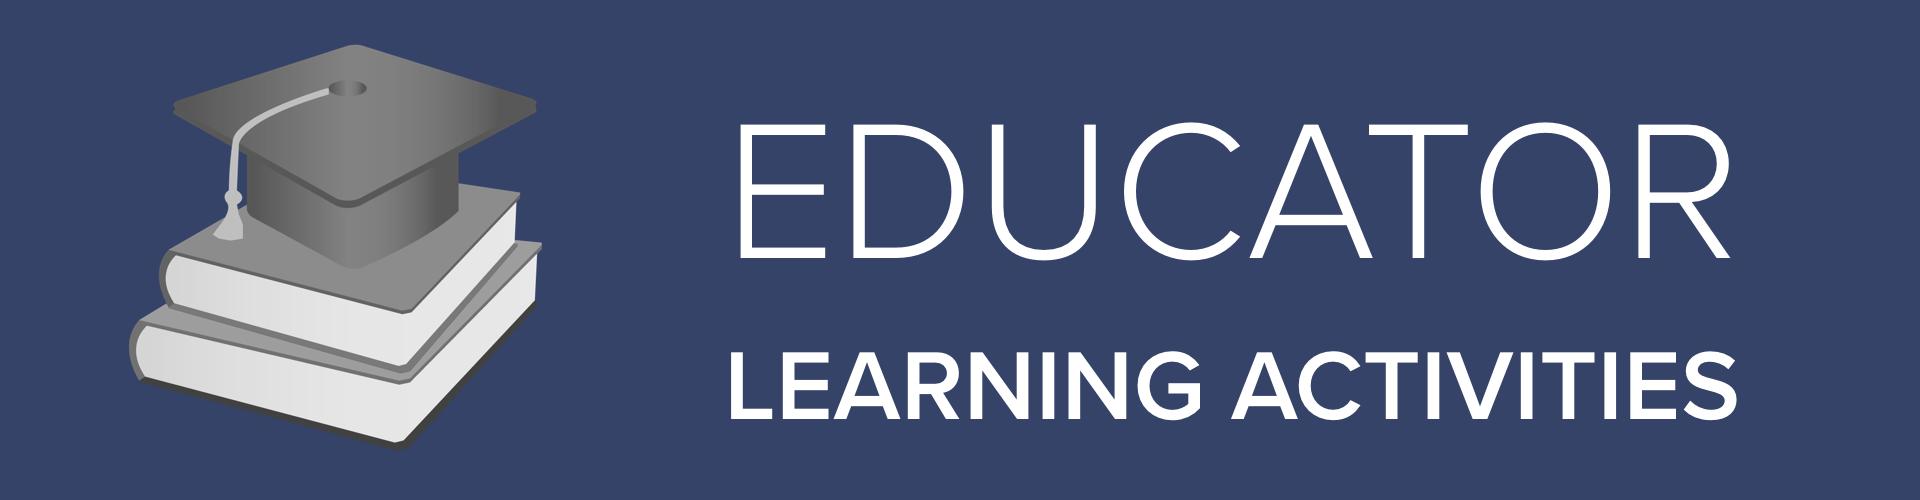 Educator Learning Activity